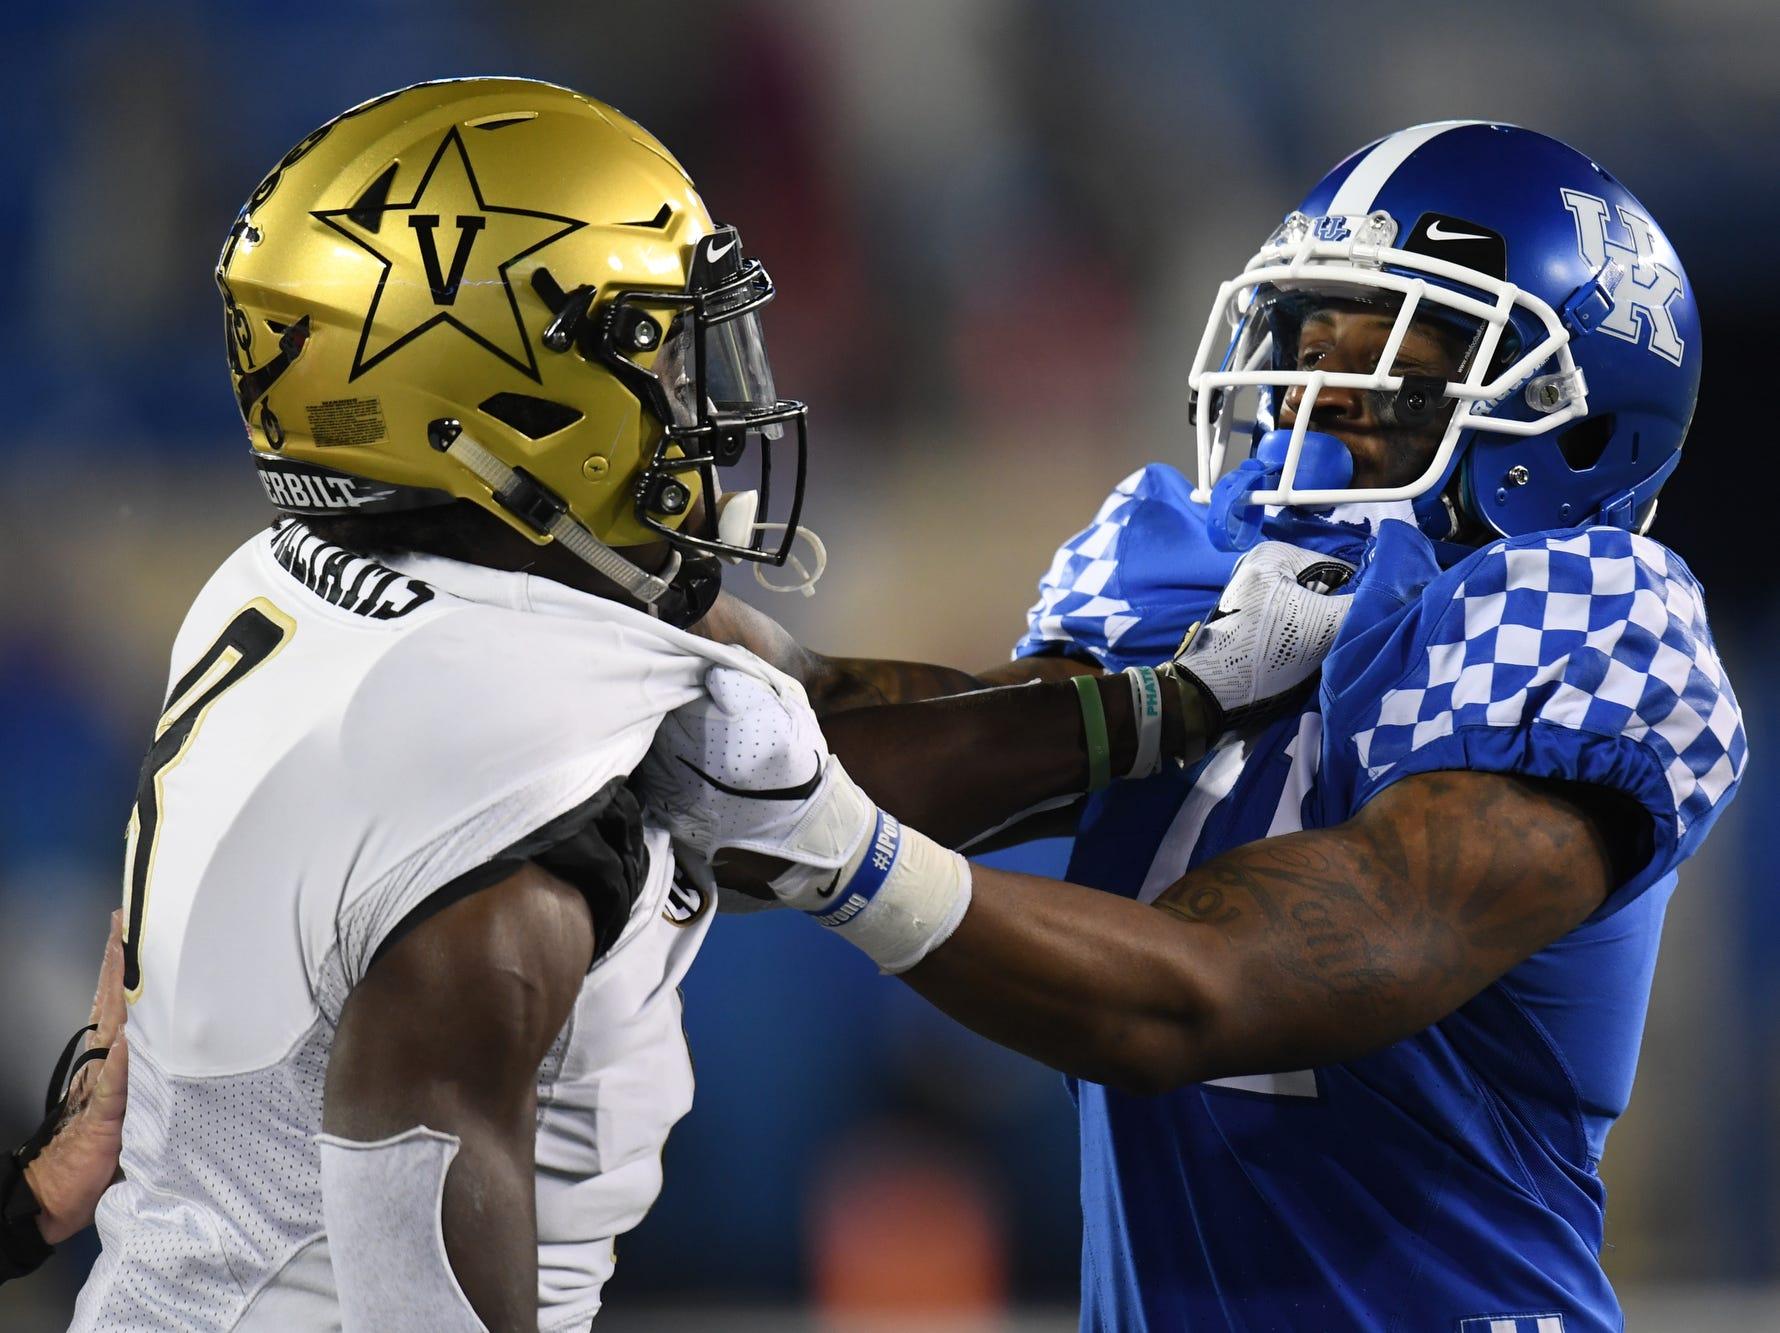 UK WR Tavin Richardson and Vanderbilt CB Joejuan Williams grab each other during the University of Kentucky football game against Vanderbilt at Kroger Field in Lexington, Kentucky on Saturday, October 20, 2018.